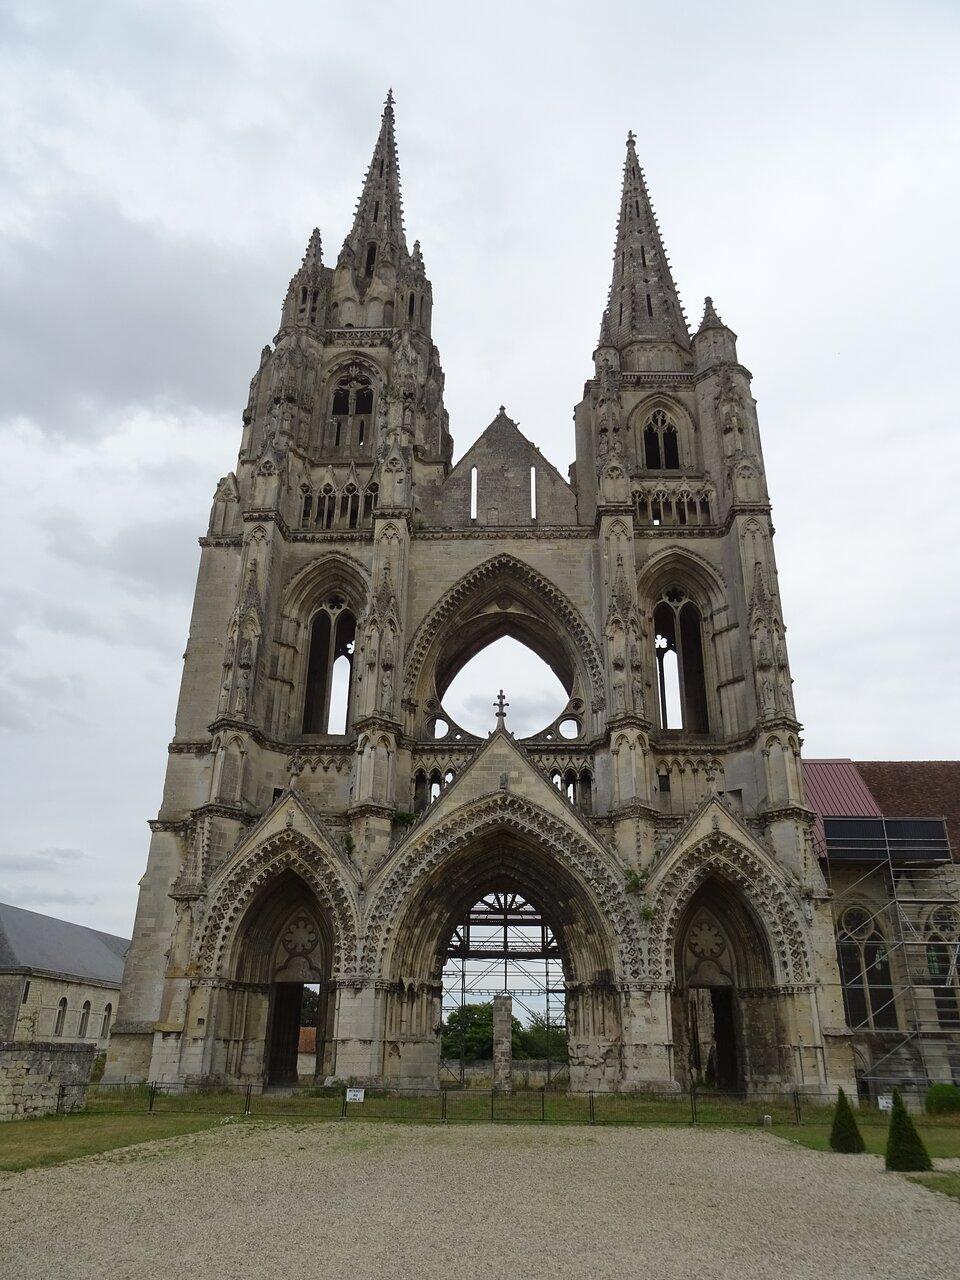 Abbaye Saint Jean Des Vignes : abbaye, saint, vignes, Abbaye, Saint, Vignes, Picture, Saint-Jean-des-Vignes,, Soissons, Tripadvisor